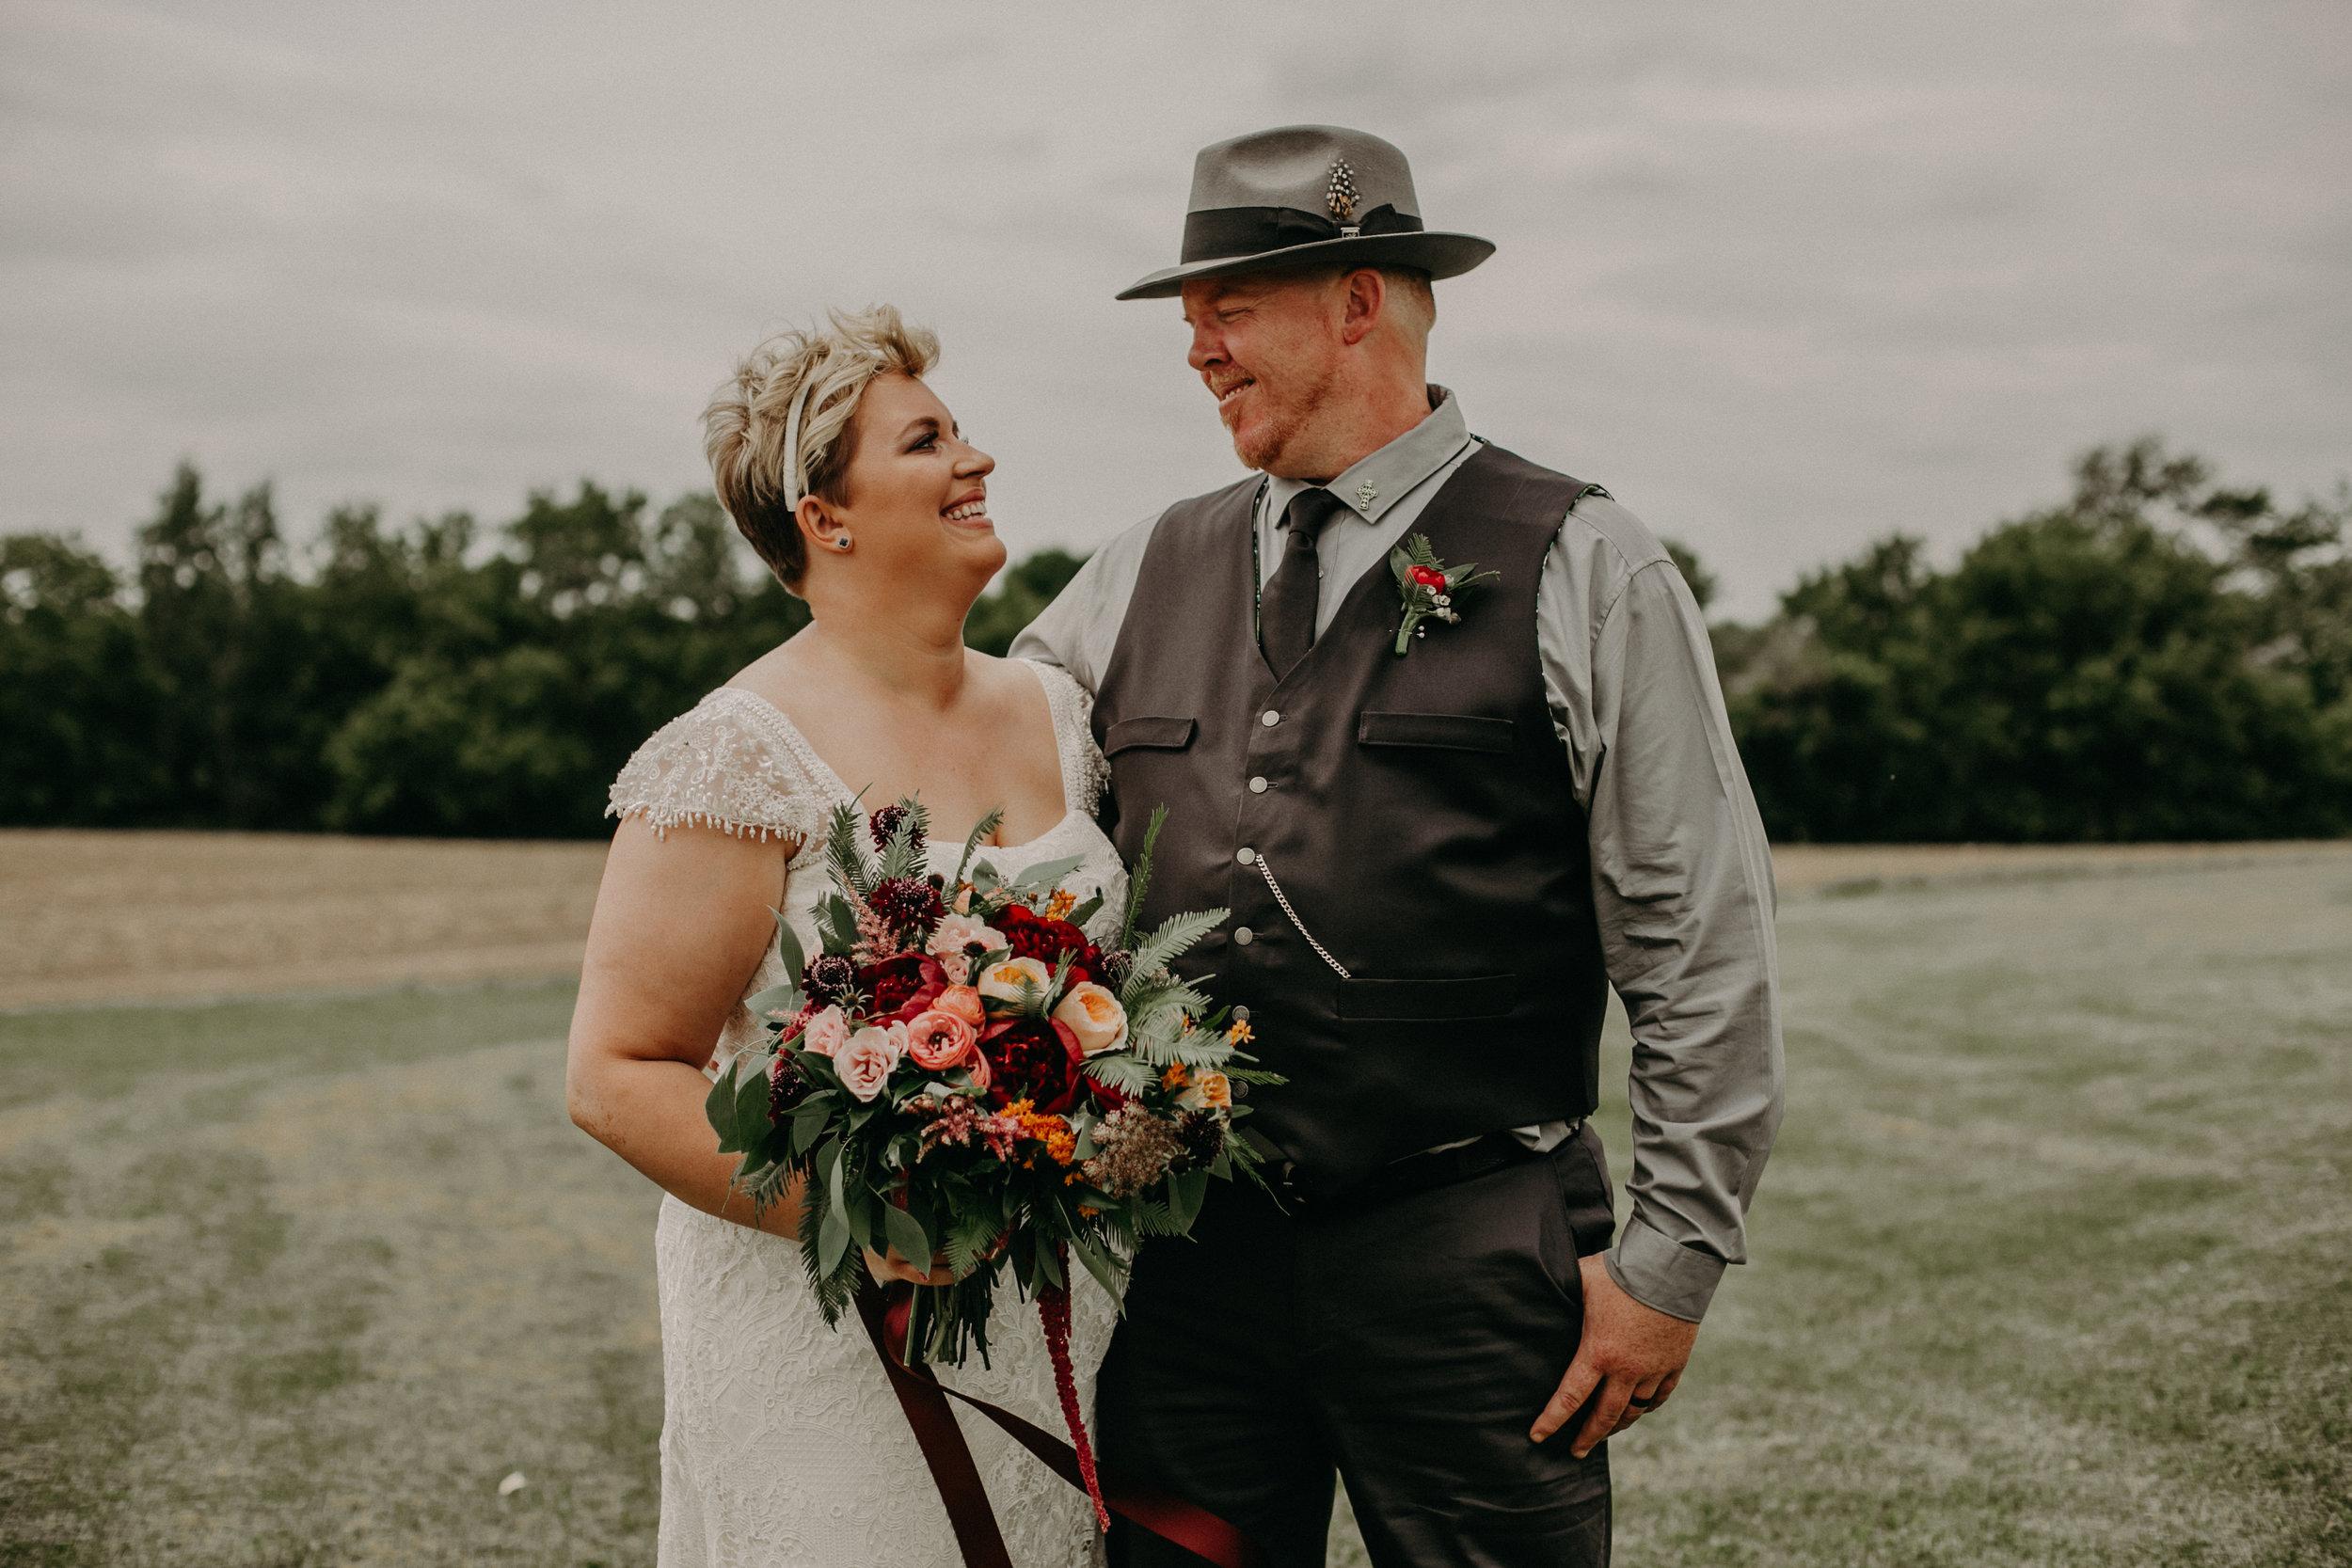 ellsworth wi wedding photographer Andrea Wagner captures outdoor portraits of bride and groom